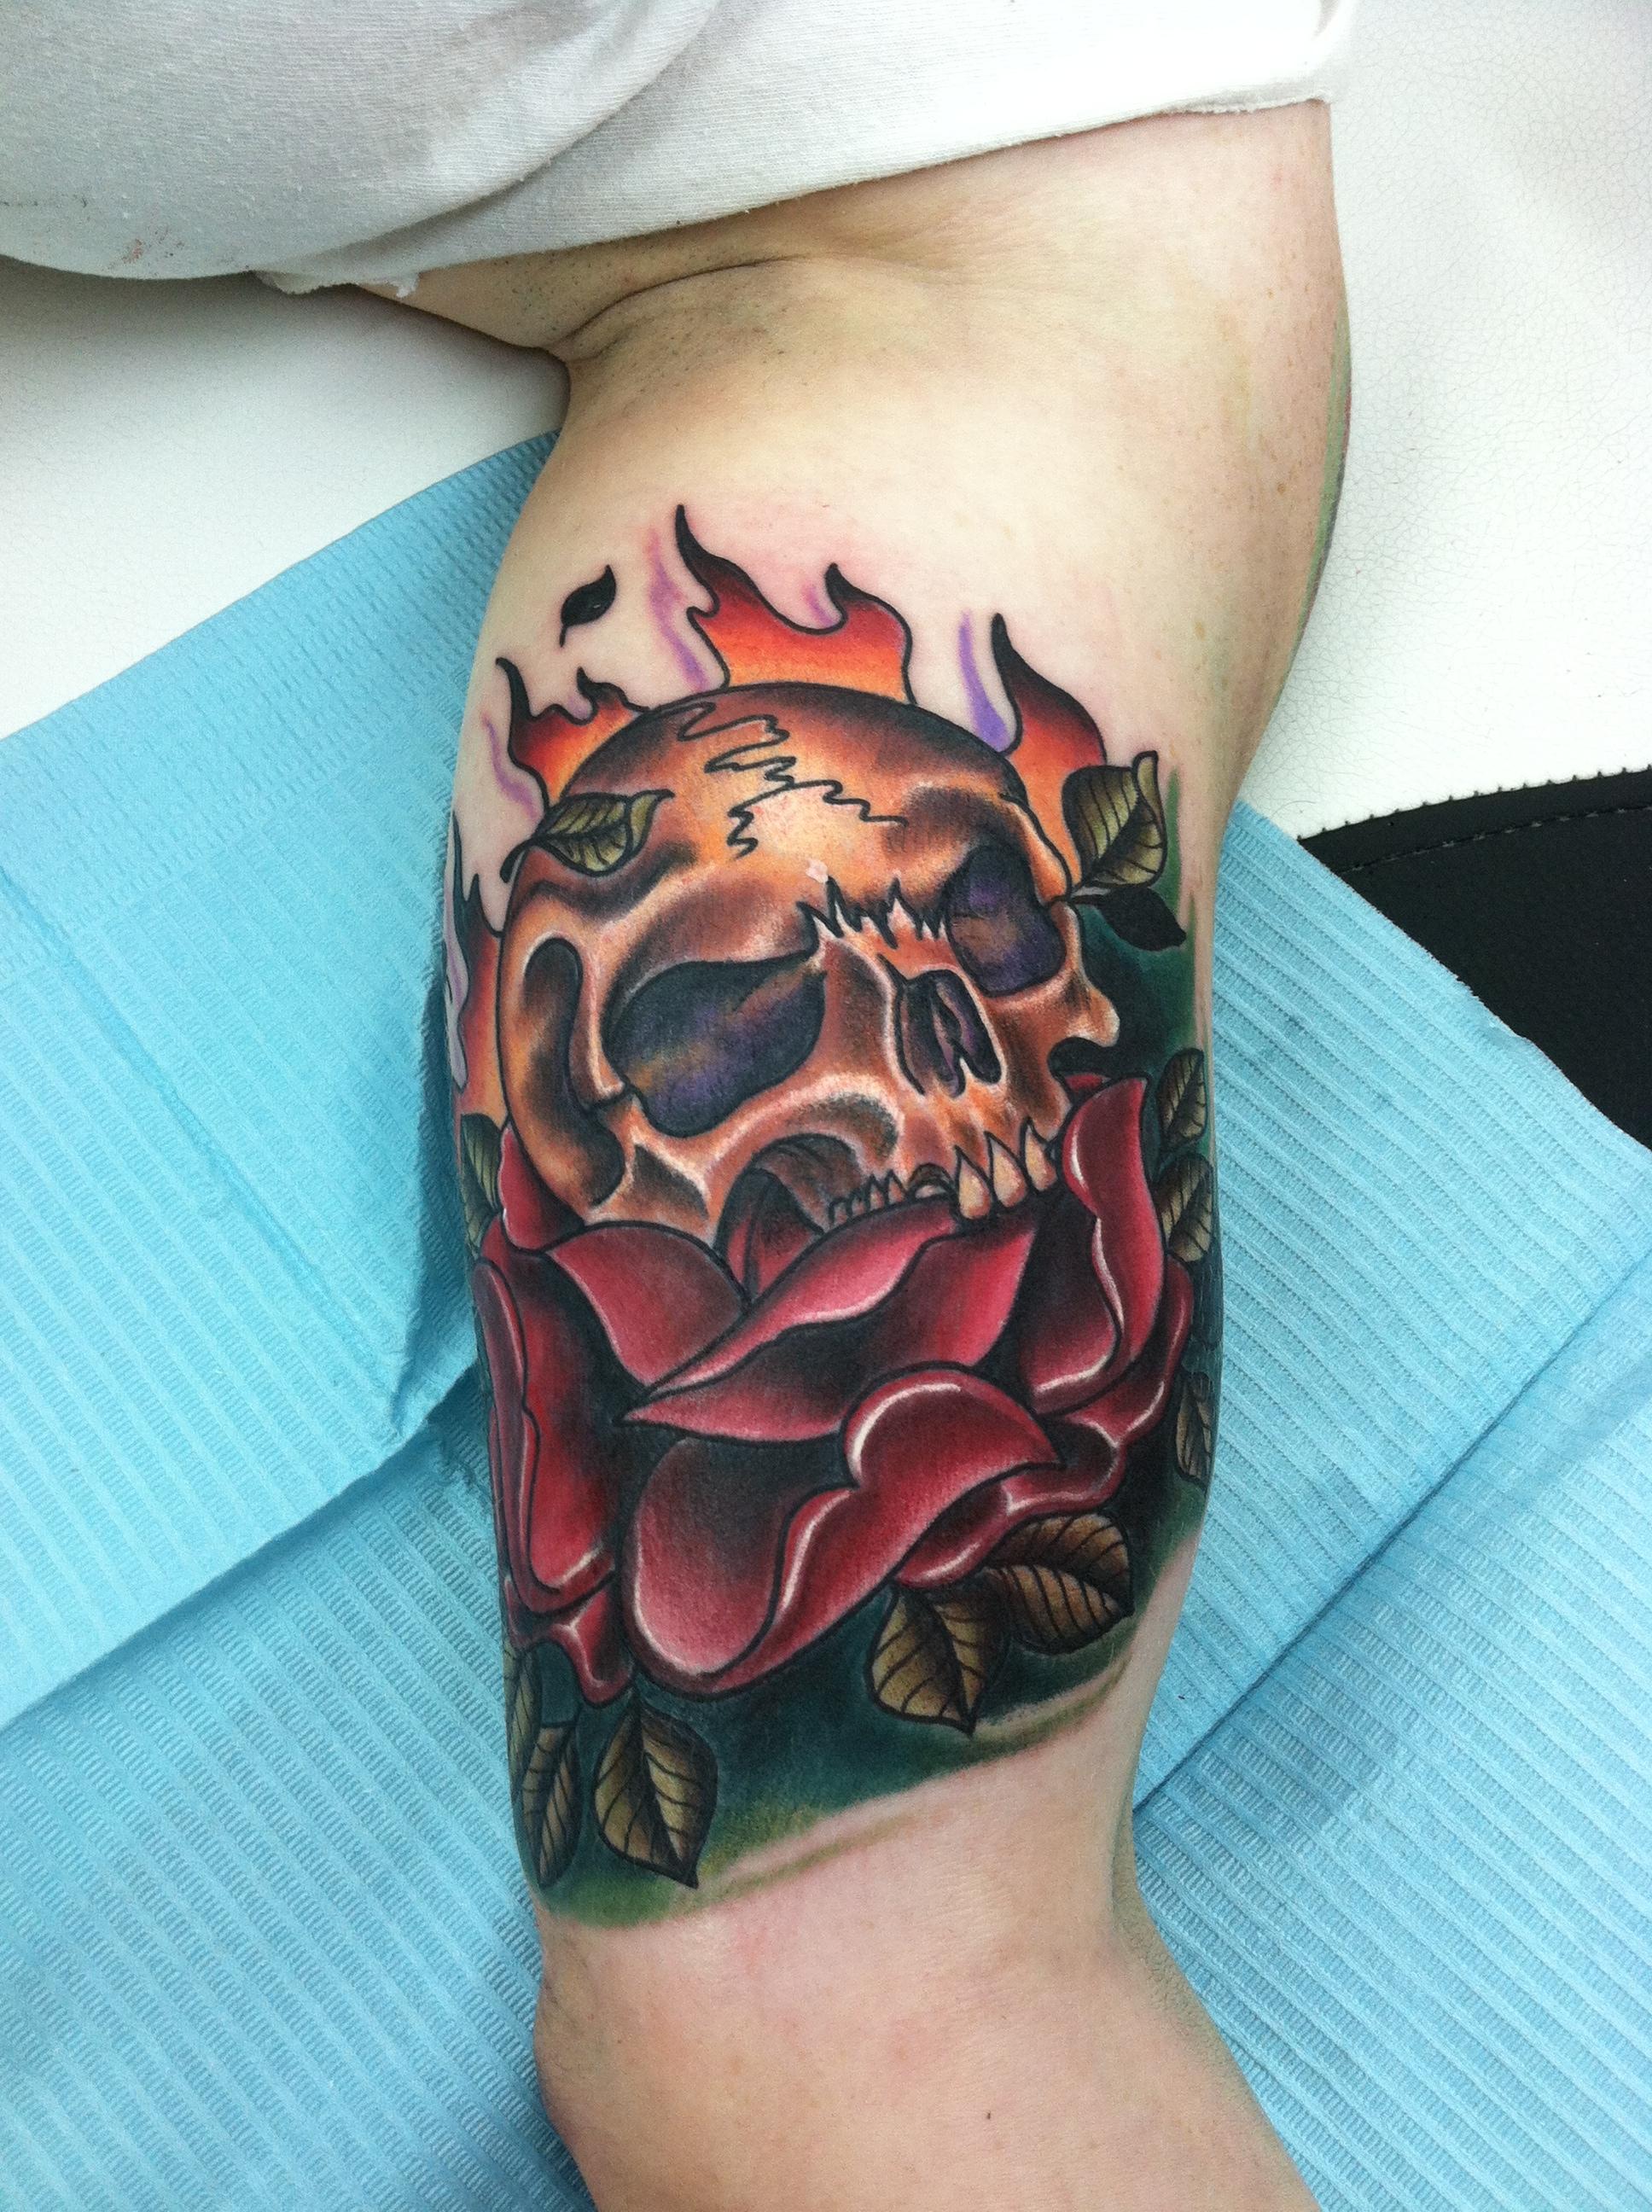 tough_manly_sexy_hot_custom_realistic_traditional_illustrative_skull_rose_and_flame_inner_arm_tattoo_david_meek_true_til_death_tattoo_compay_ashtabula_ohio